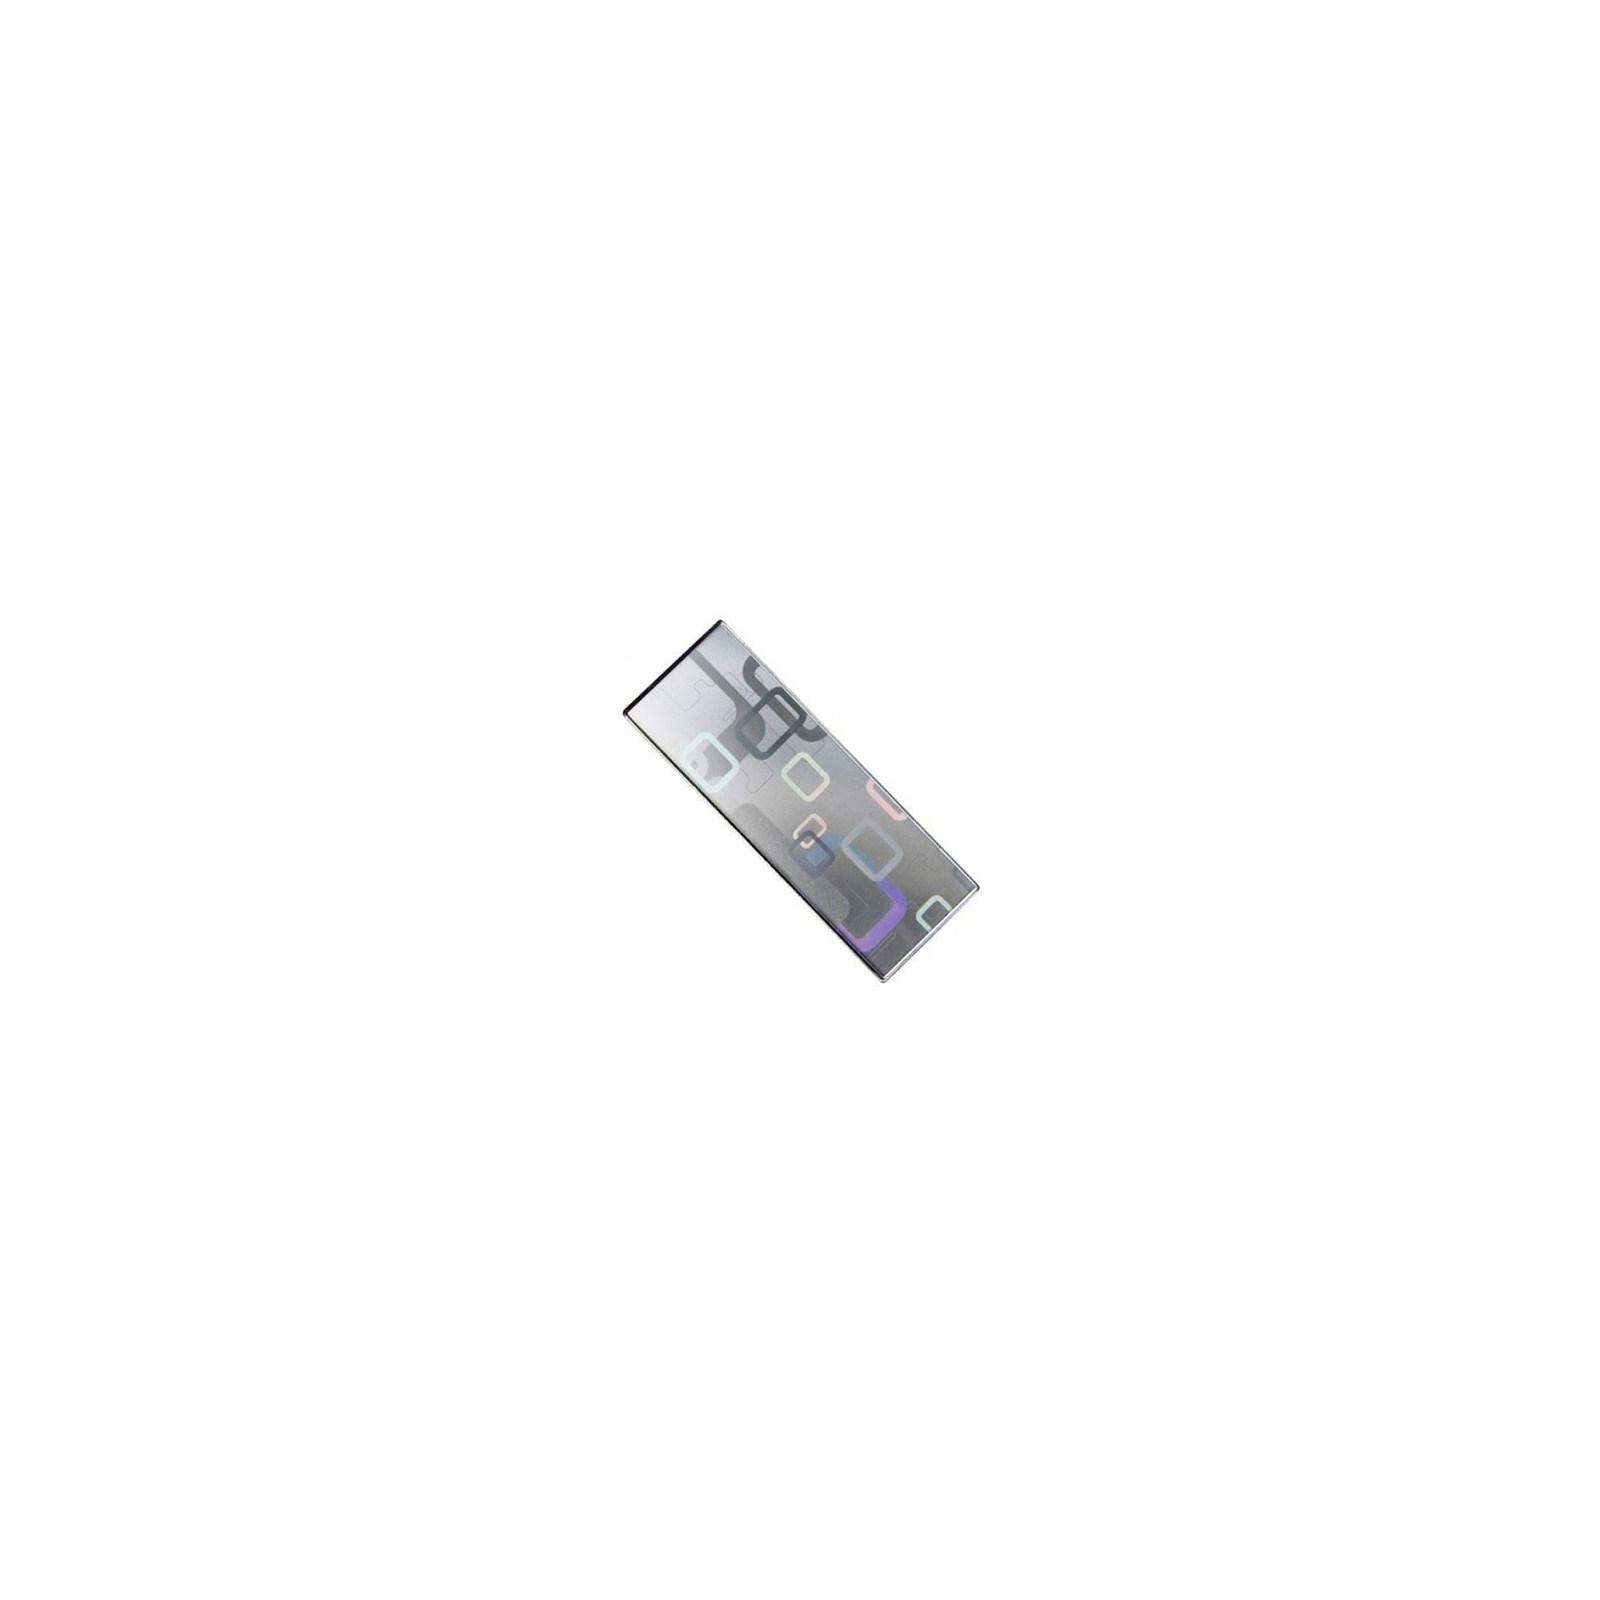 USB флеш накопитель Transcend 32Gb JetFlash V90С (TS32GJFV90C)